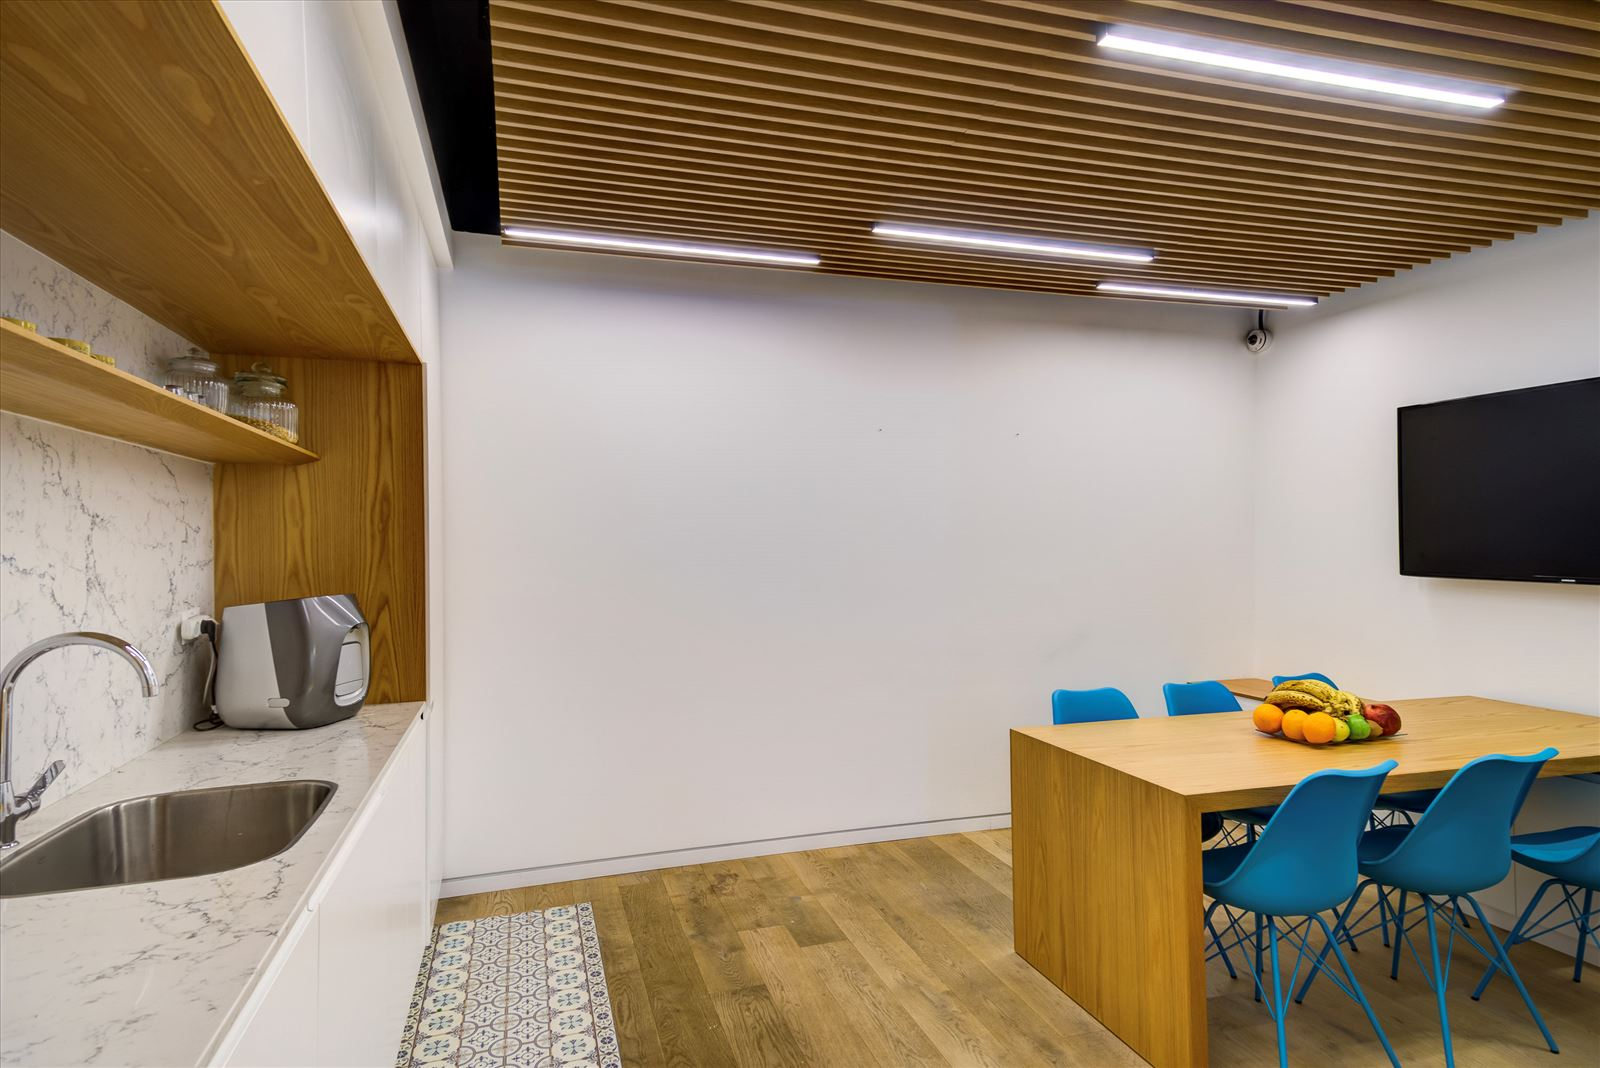 Pie Technology Office - פרויקט תאורה על ידי קמחי תאורה